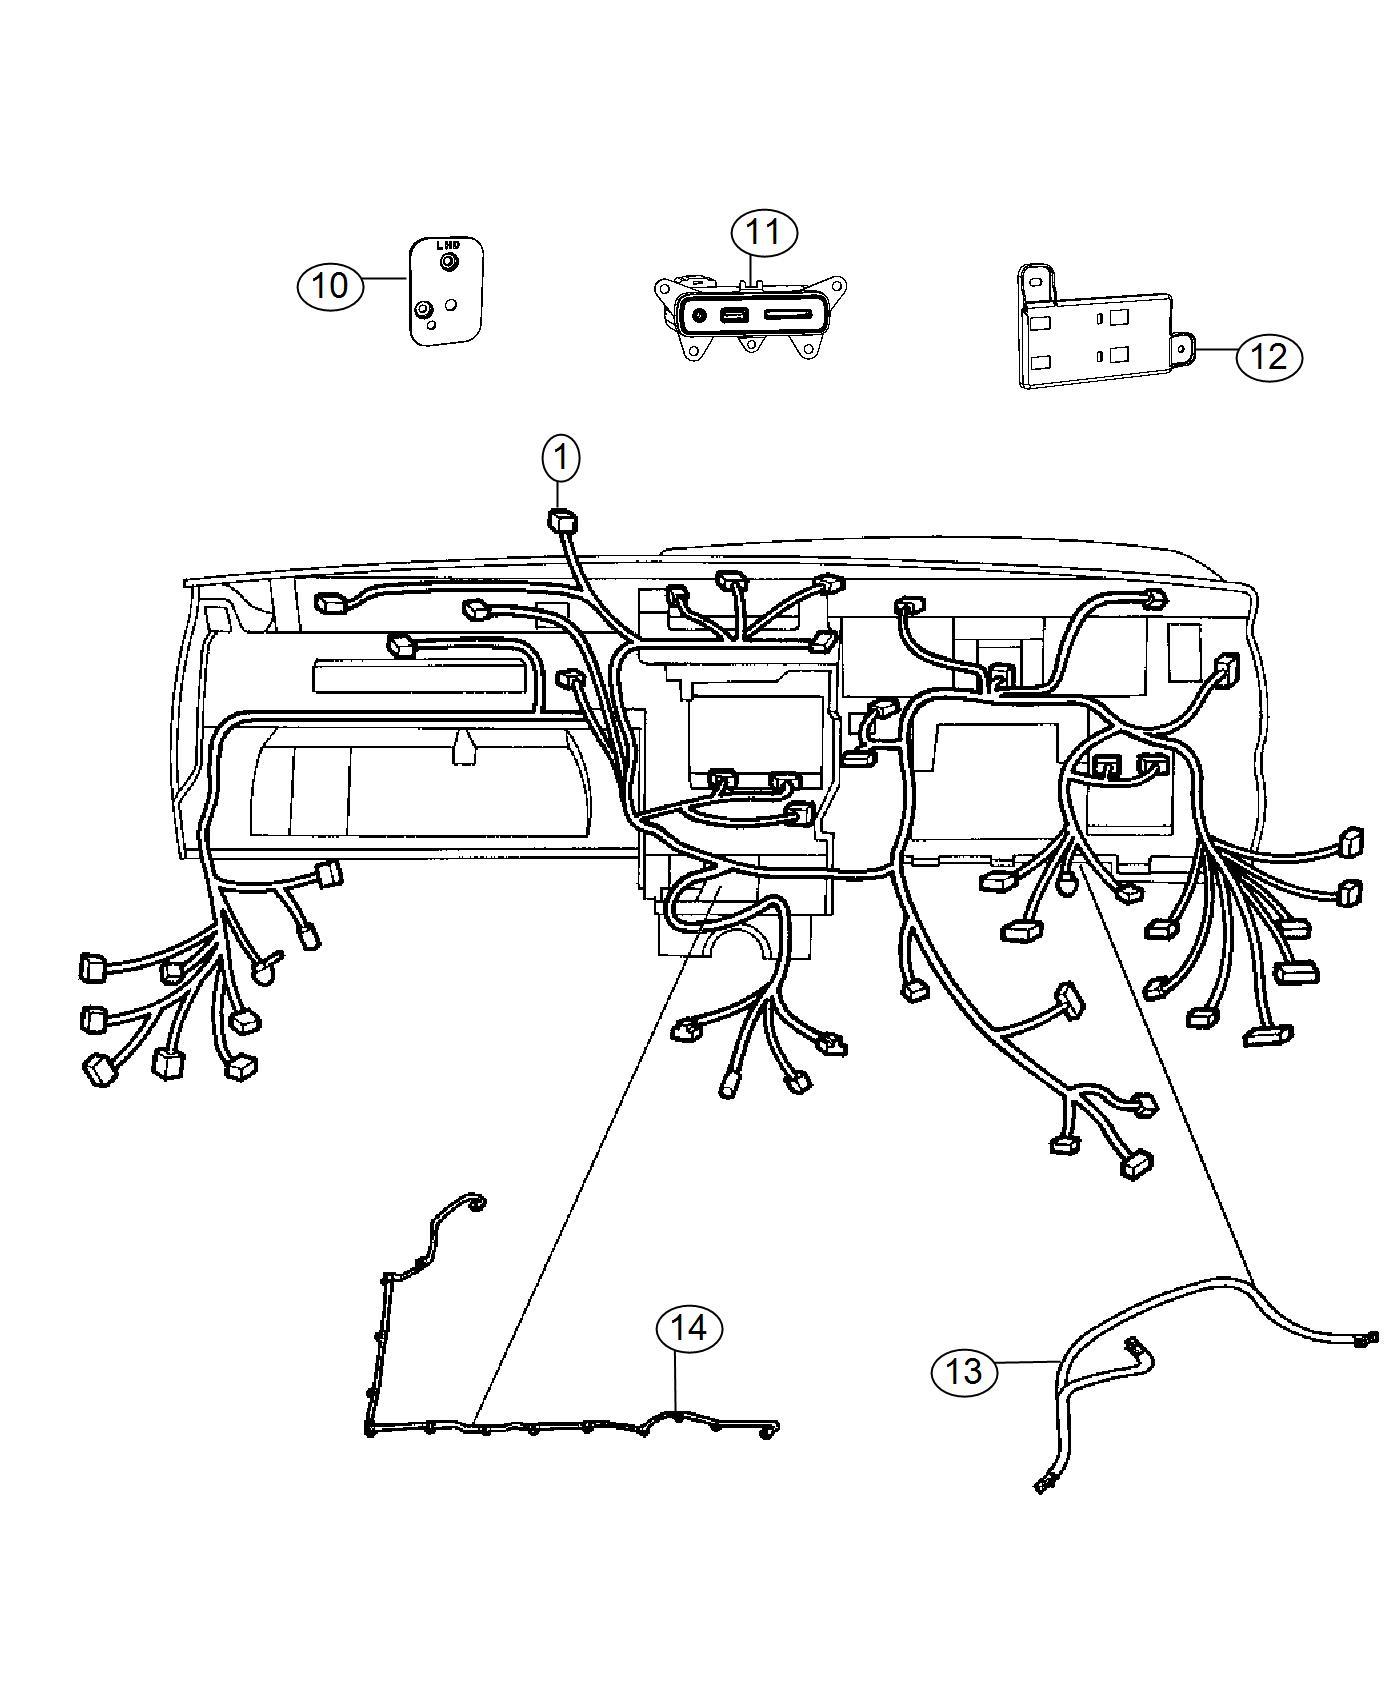 Jeep Grand Cherokee Wiring. Hands free communication